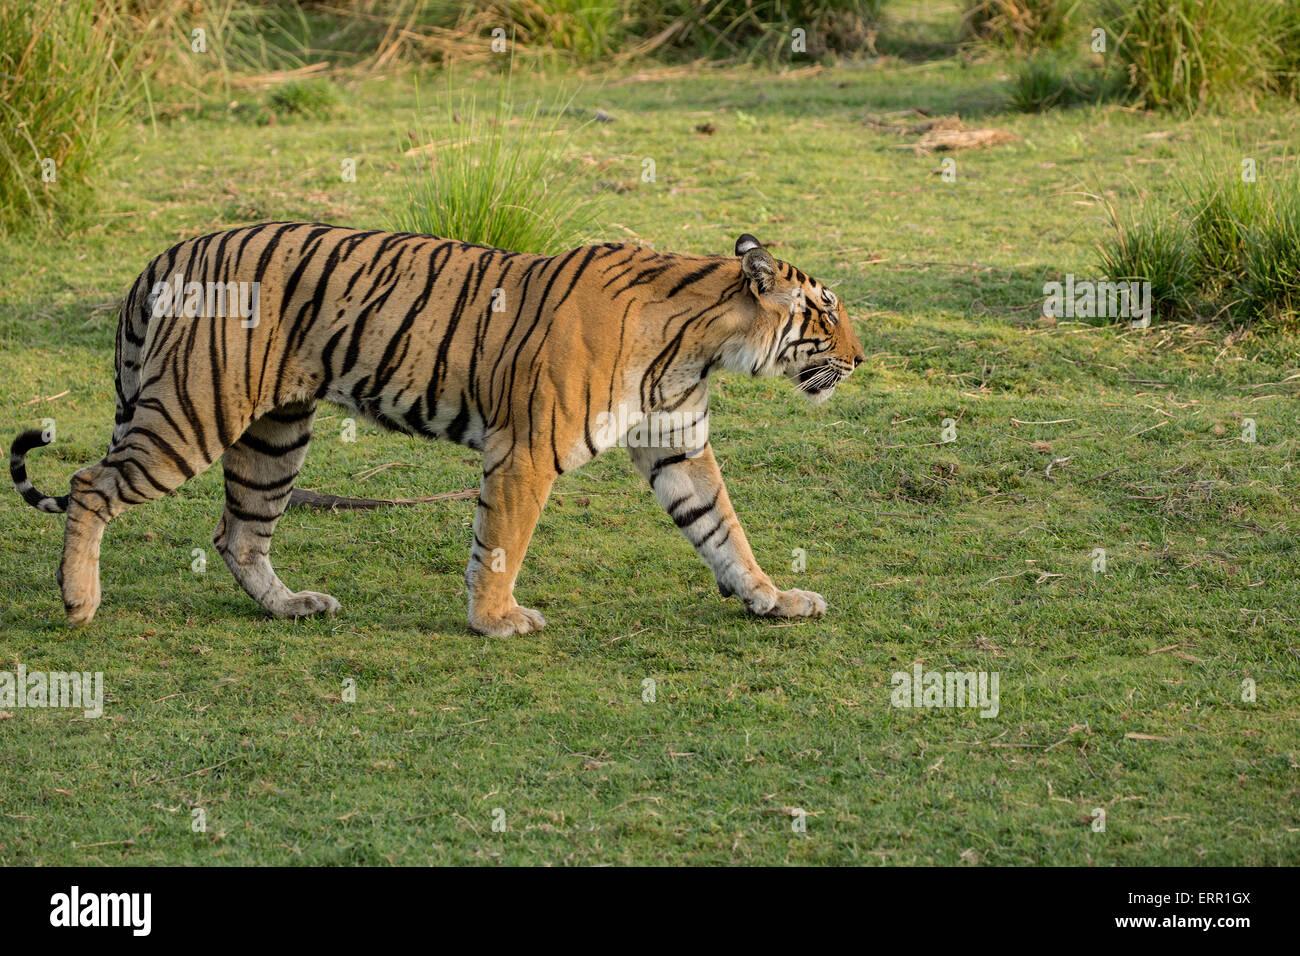 A tiger walks in lush green grass Stock Photo